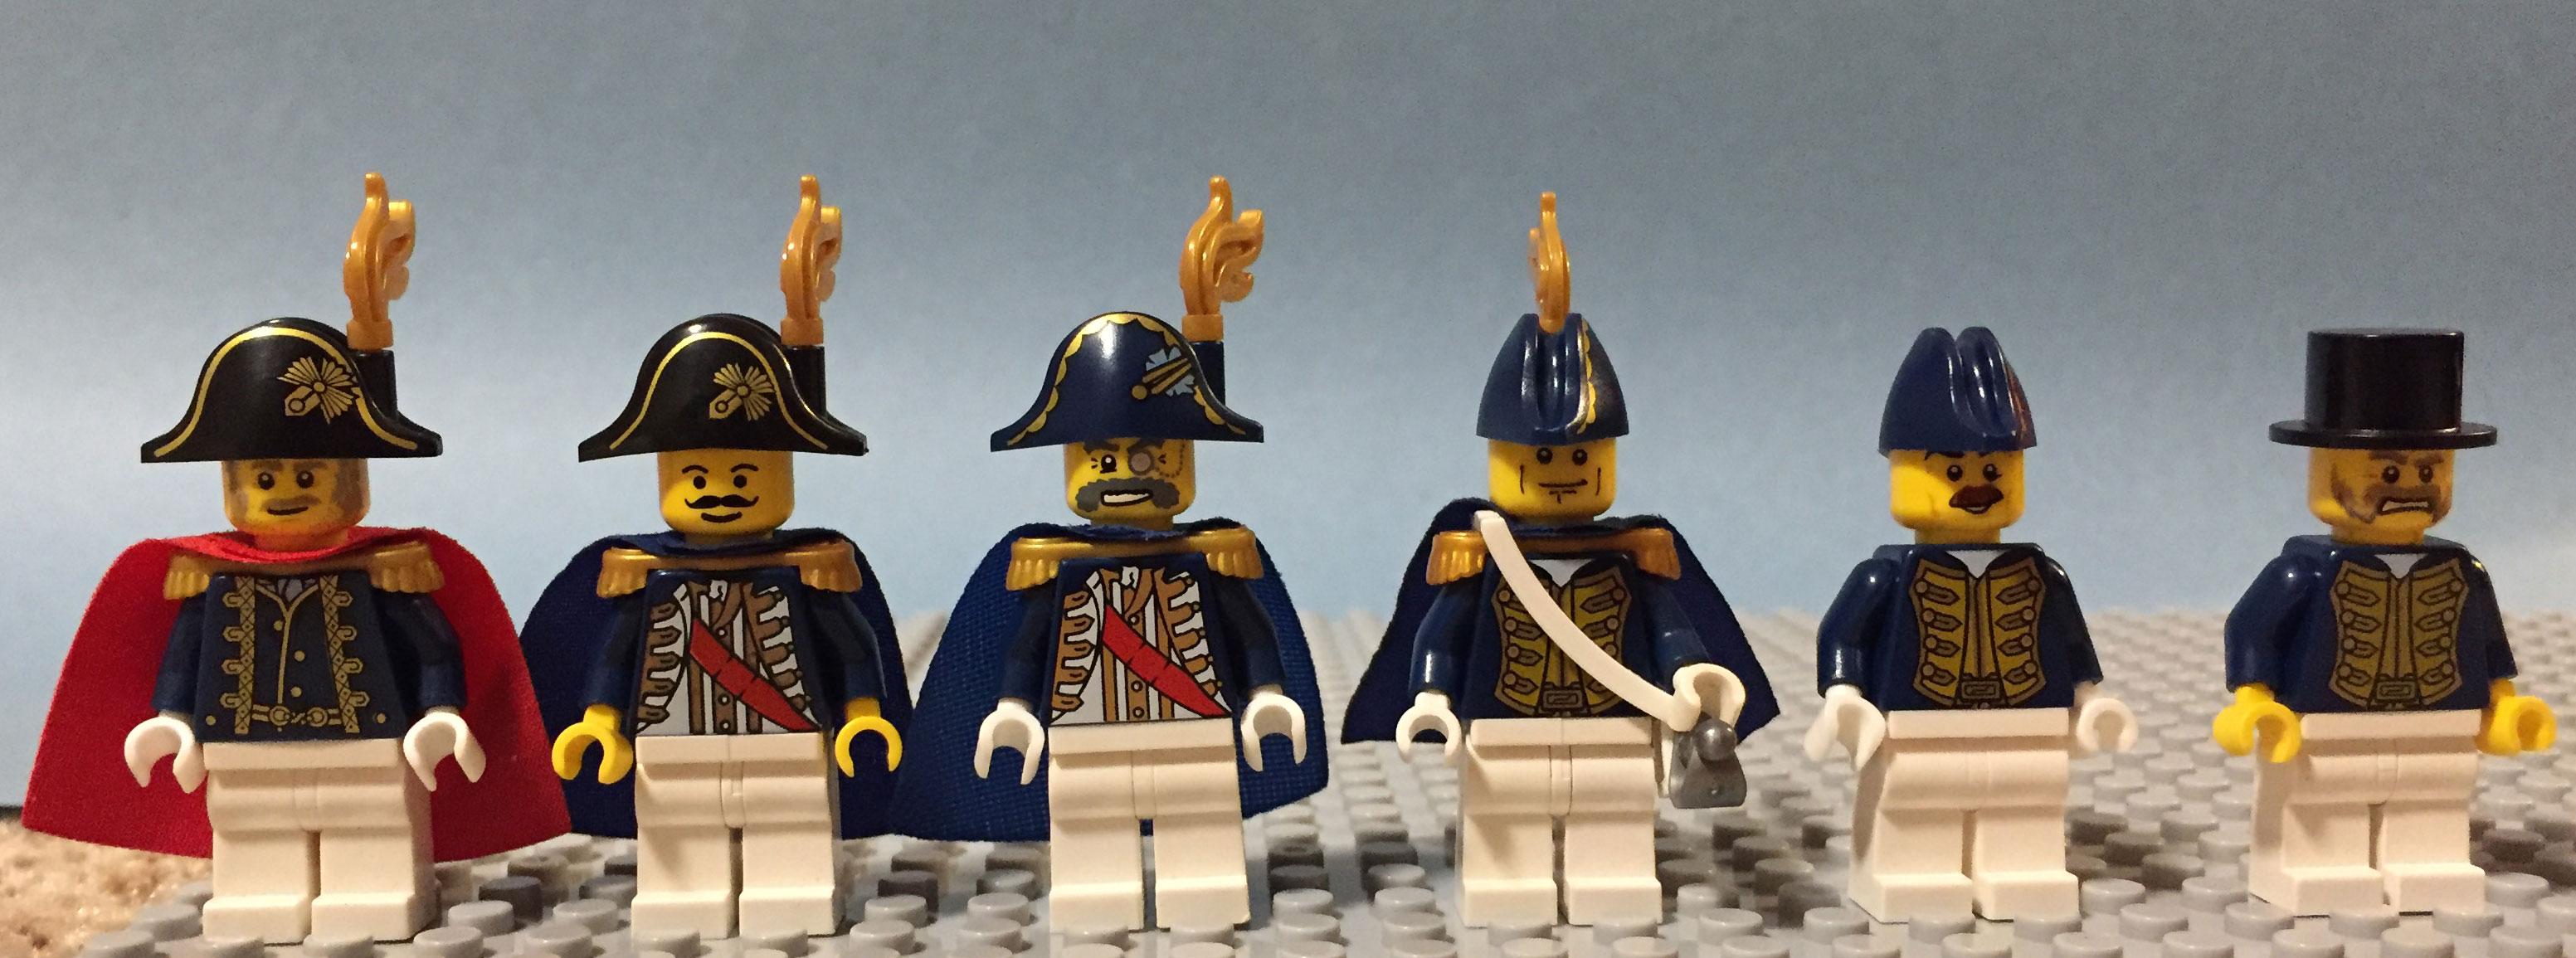 navy-officers.jpg